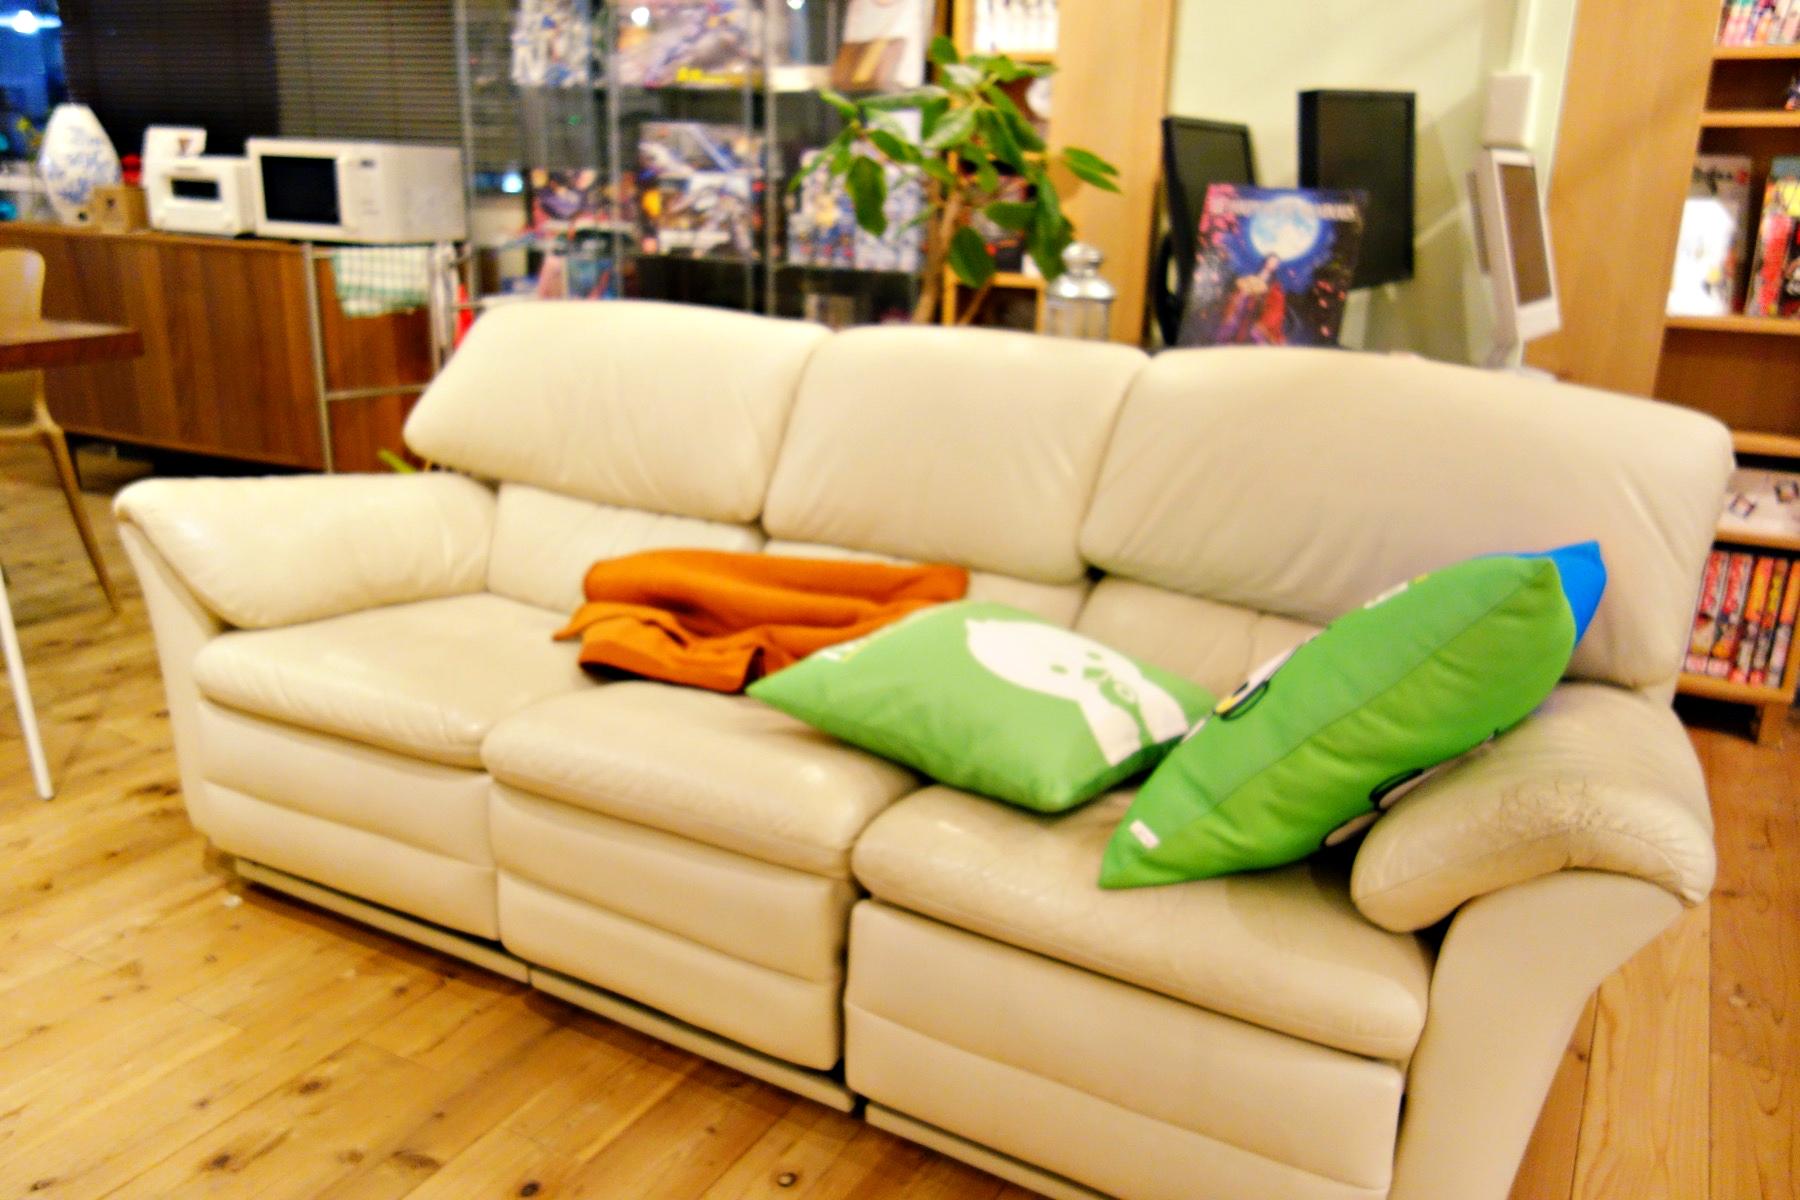 CASE SHINJUKUのソファー